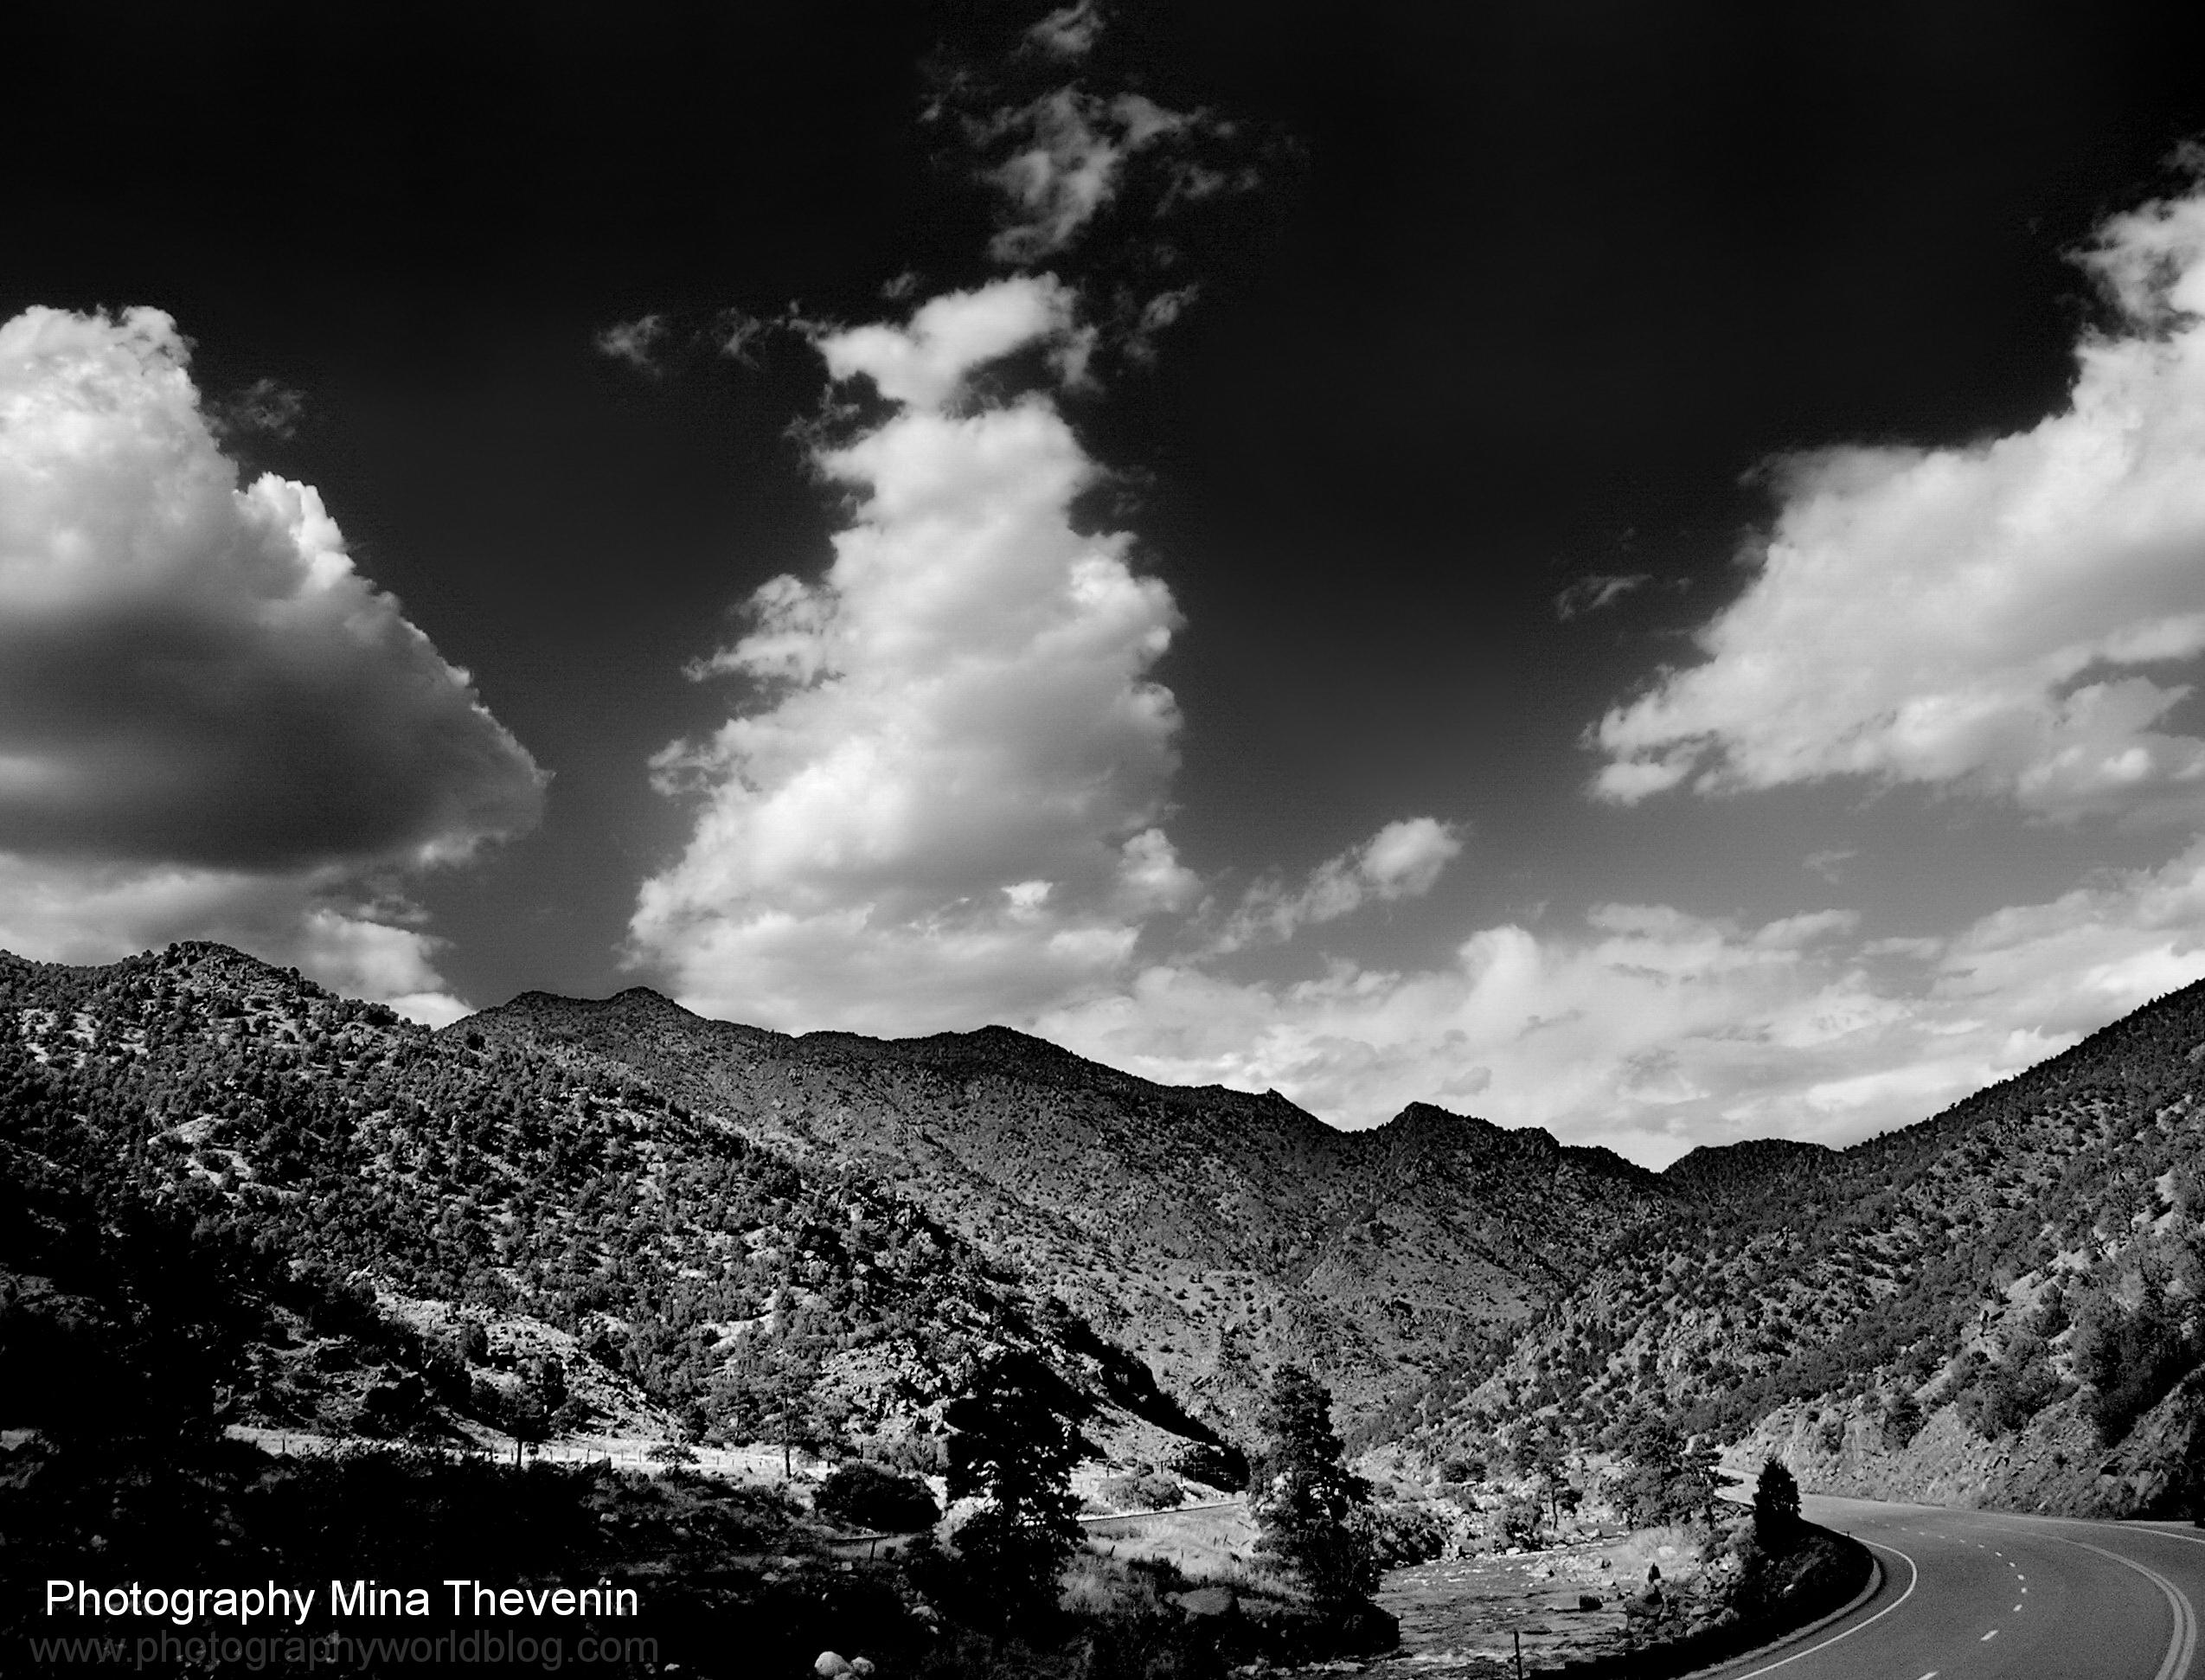 © Lenticular Clouds Colorado. Photograph by Mina Thevenin. Photography World. www.photographyworld.org